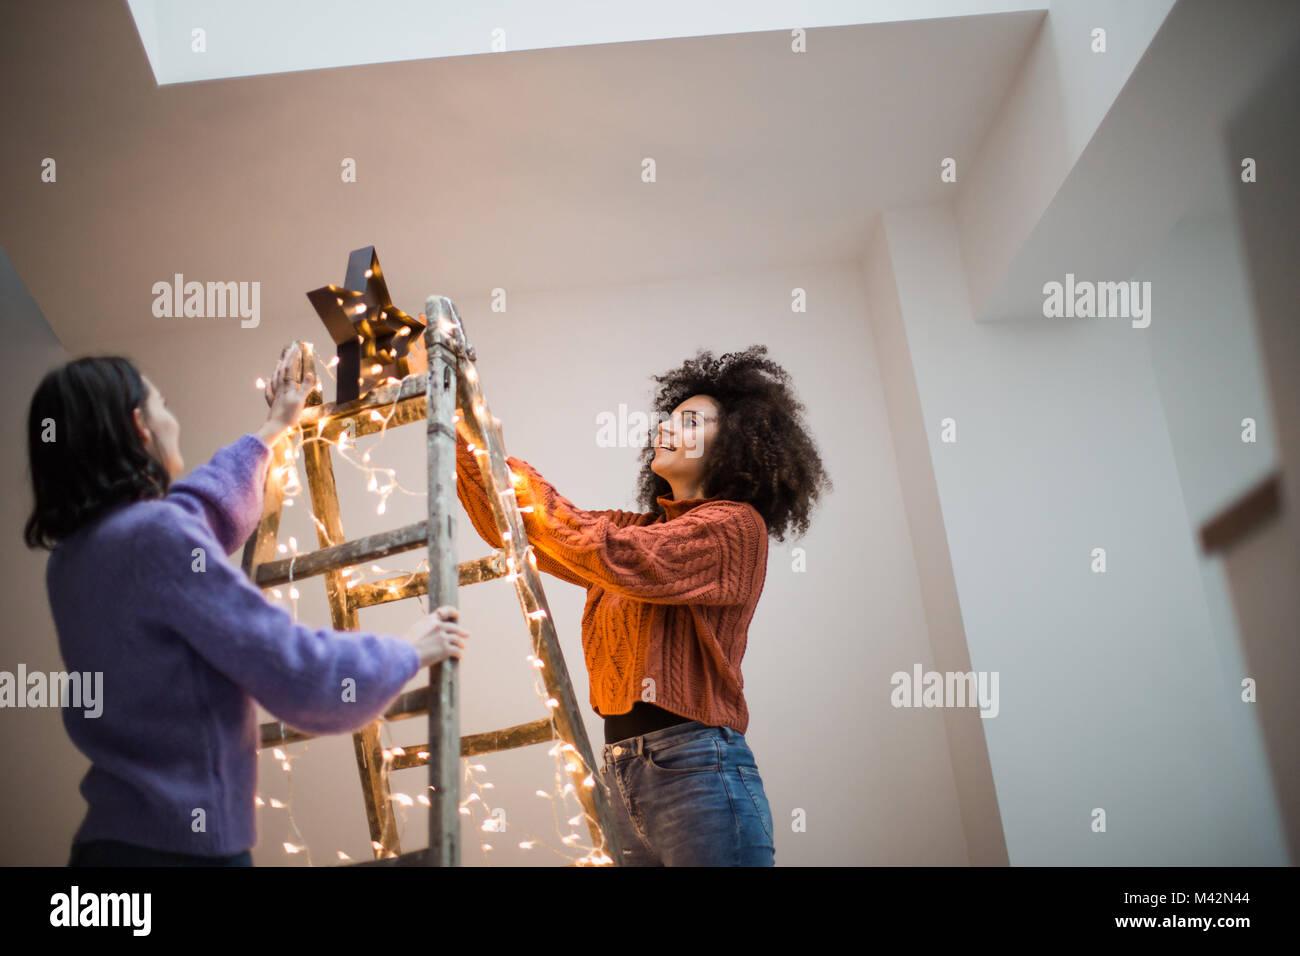 Friends decorating an alternative christmas tree - Stock Image